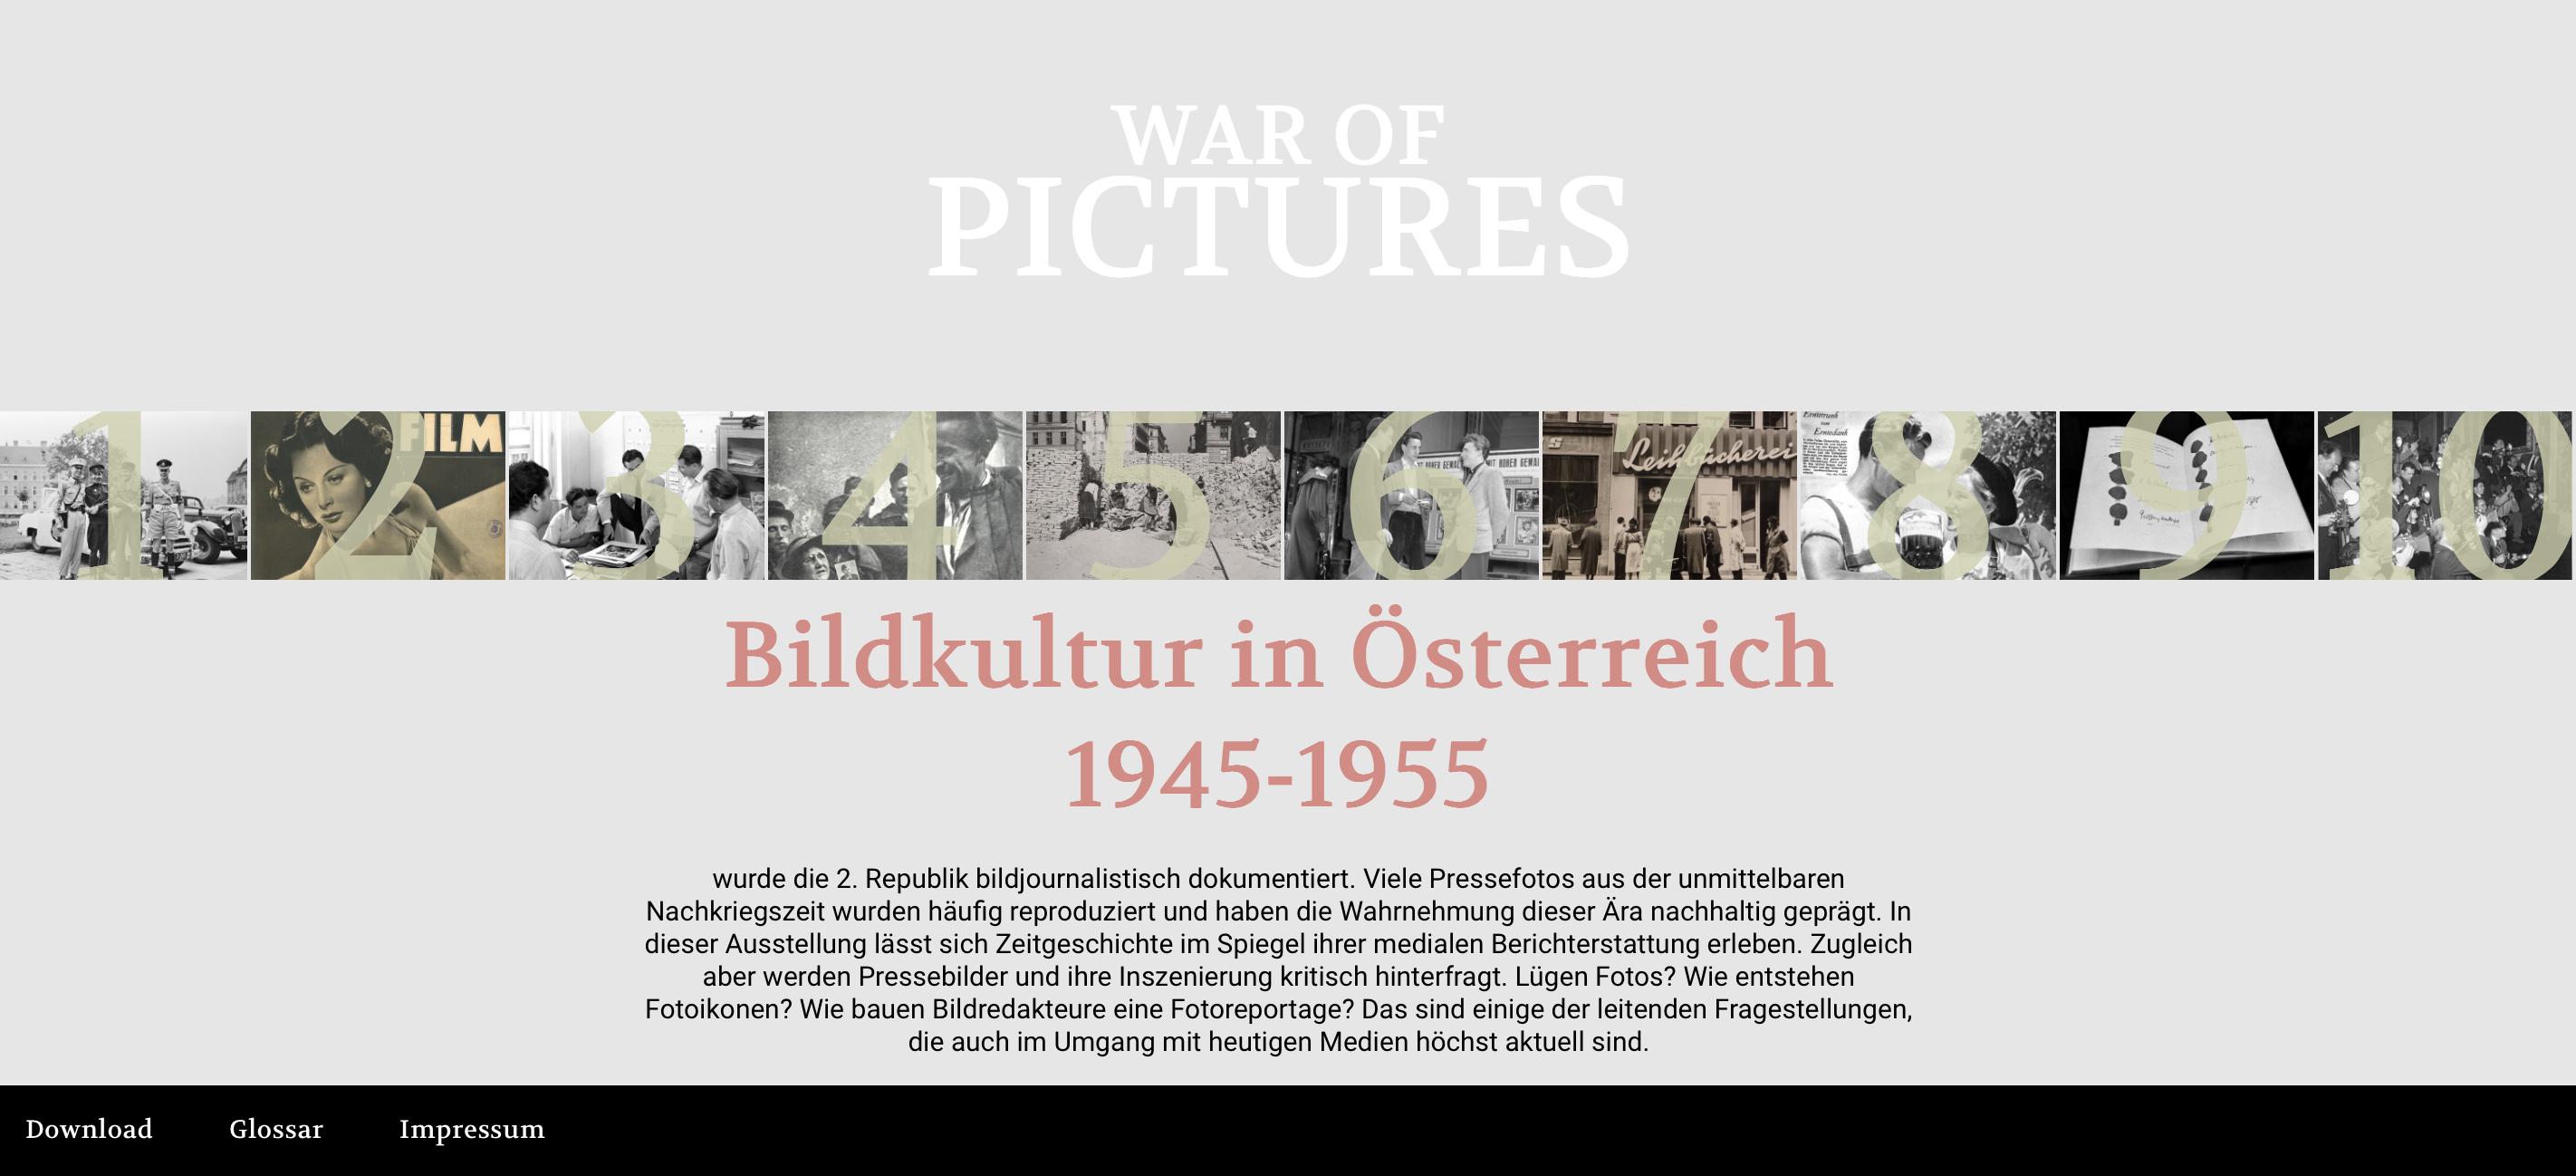 war of pictures_online ausstellung_wesearch